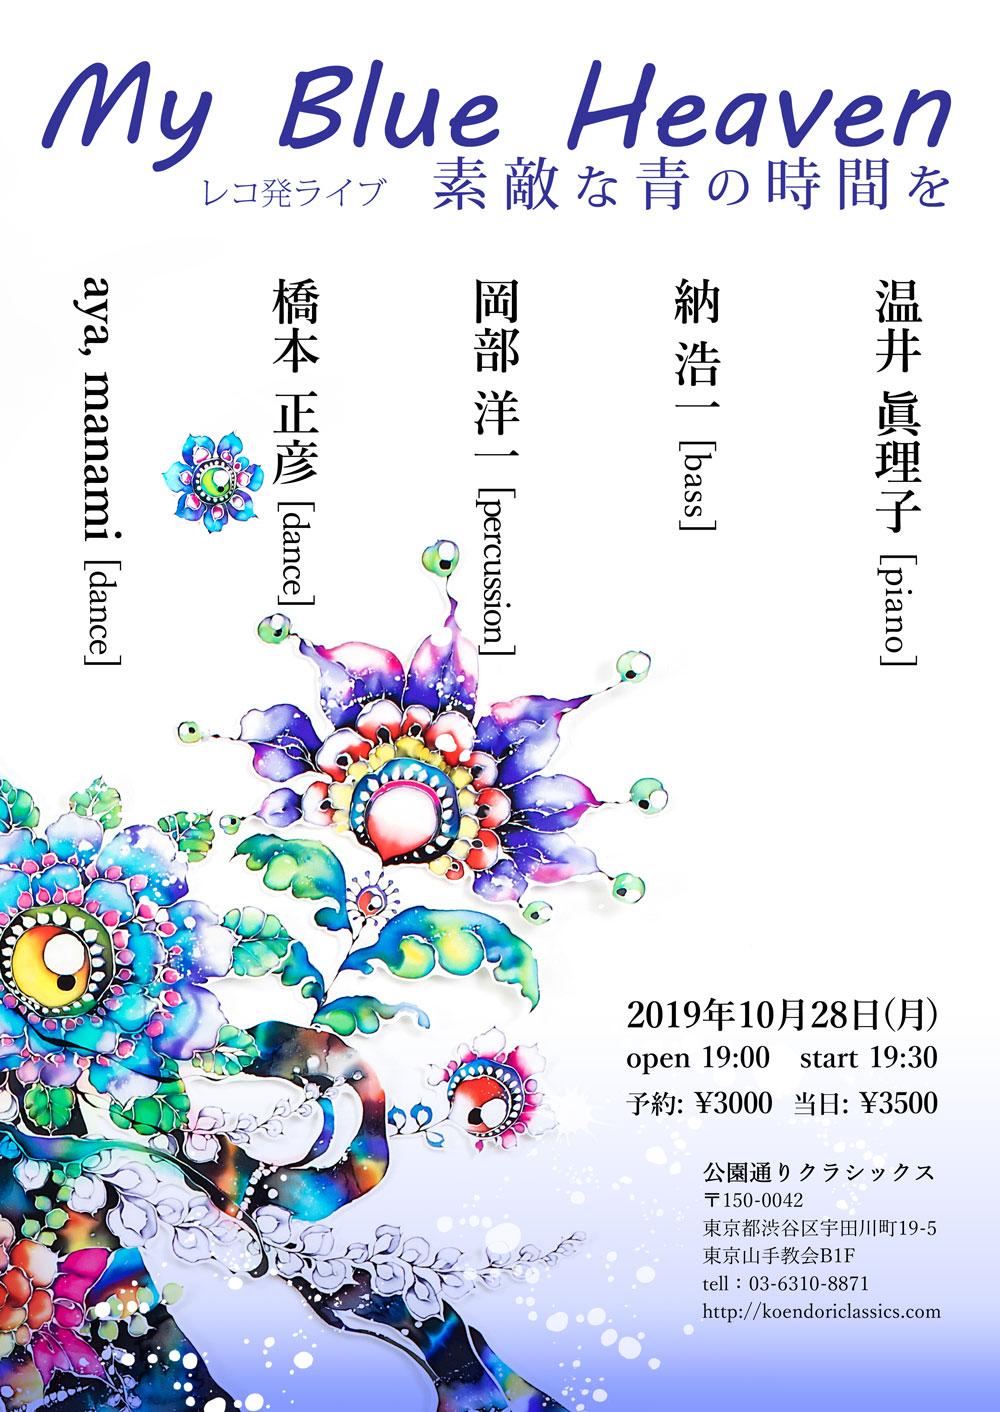 【My Blue Heaven】レコ発ライブ 〜素敵な青の時間を〜